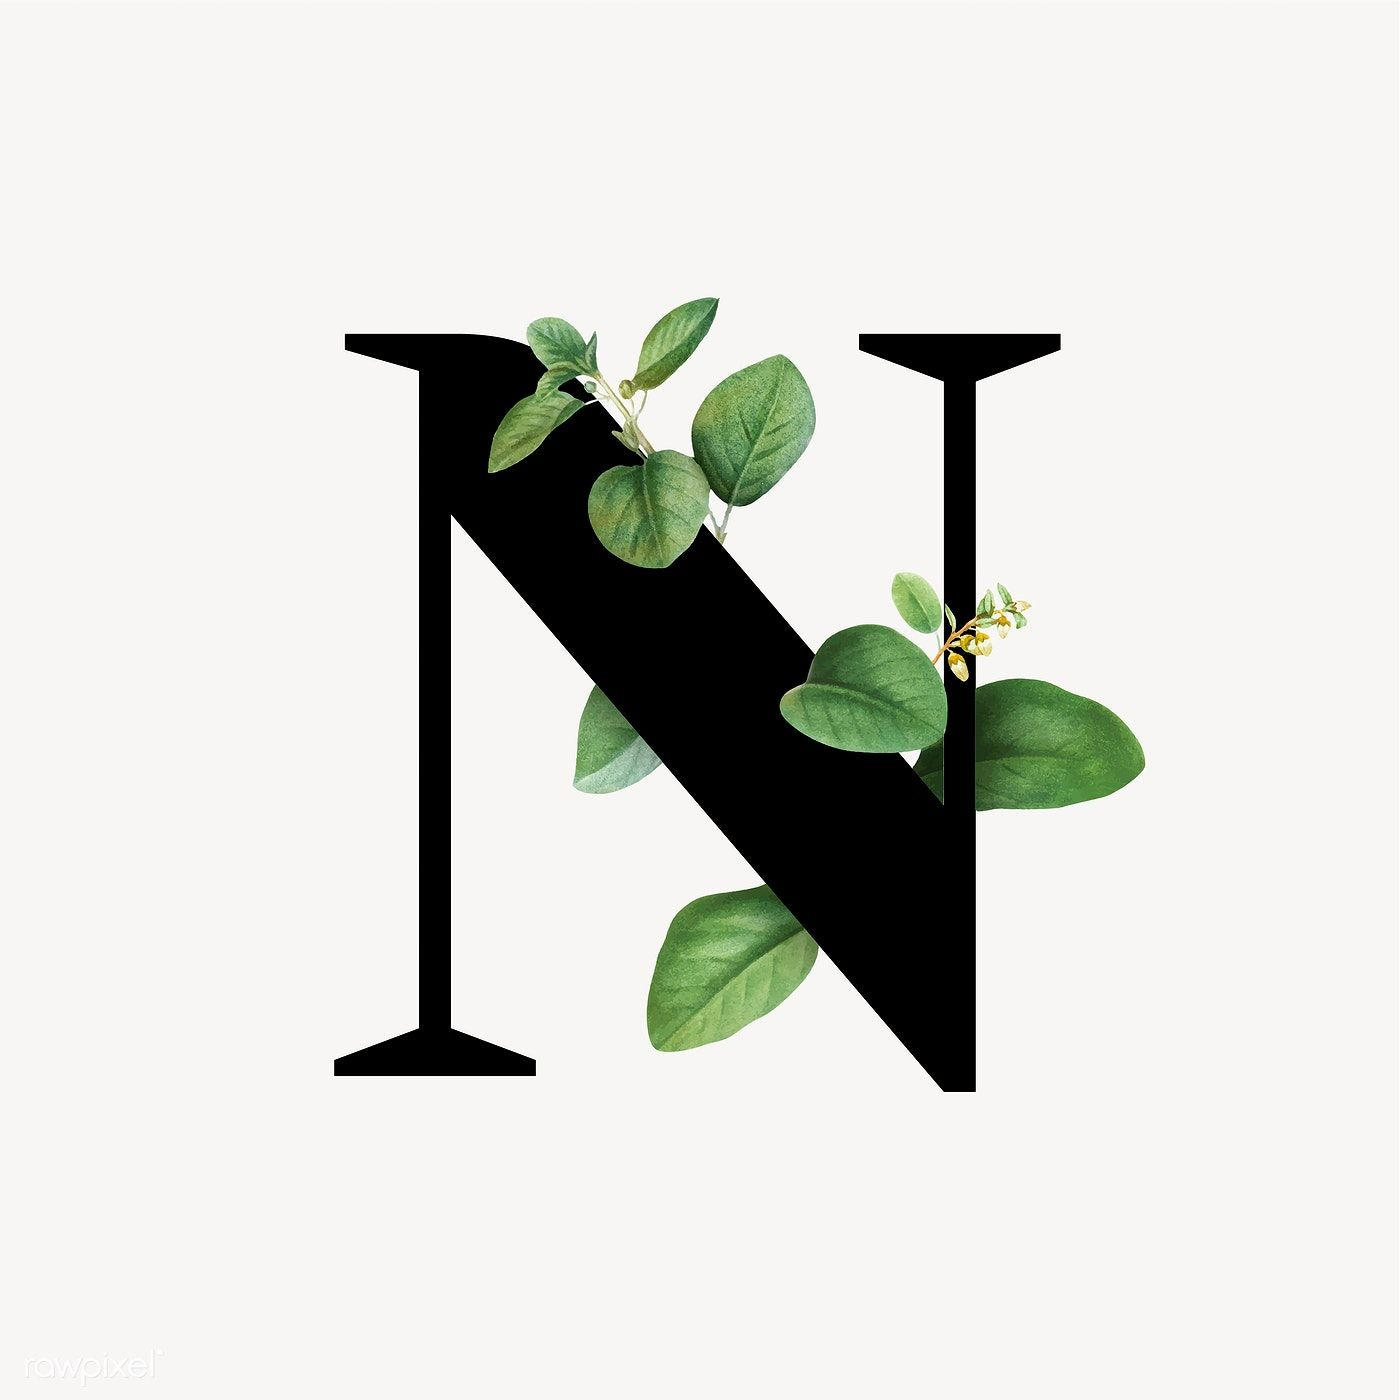 Botanical Capital Letter N Vector Premium Image By Rawpixel Com Aum Donlaya Kappy Kappy Manotang Letter N Lettering Alphabet Lettering Alphabet Fonts